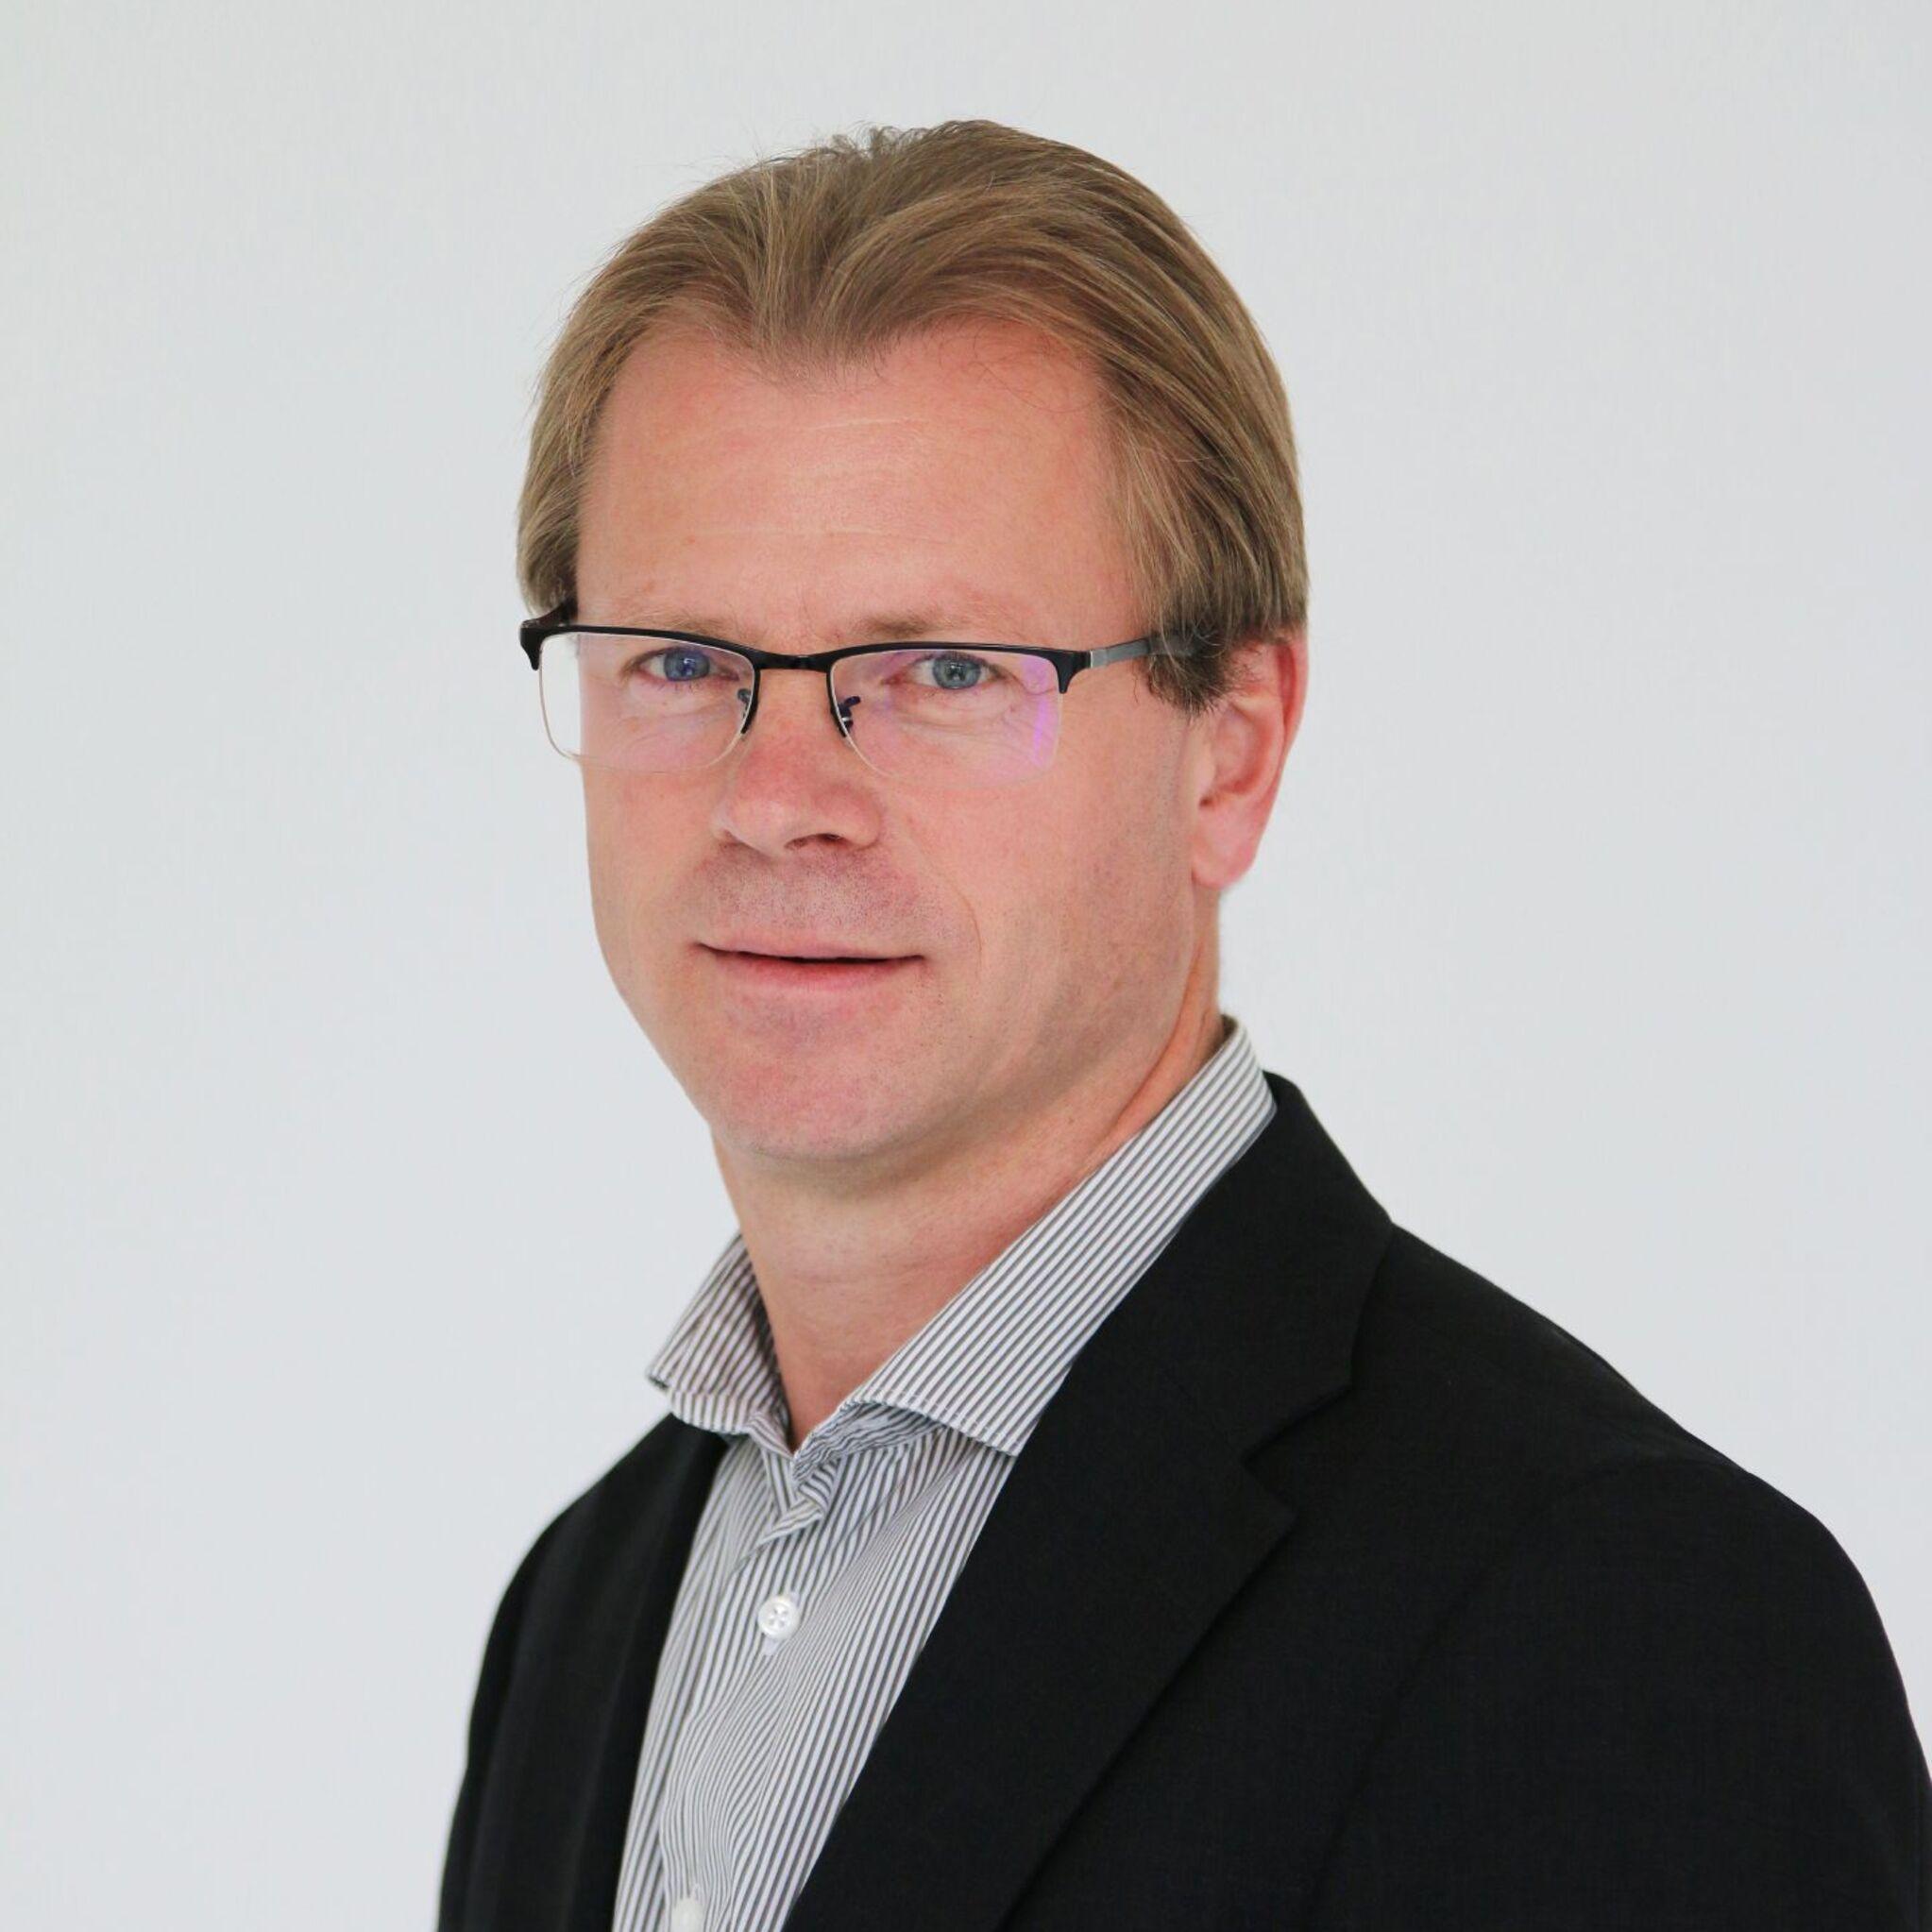 Peter Striegl